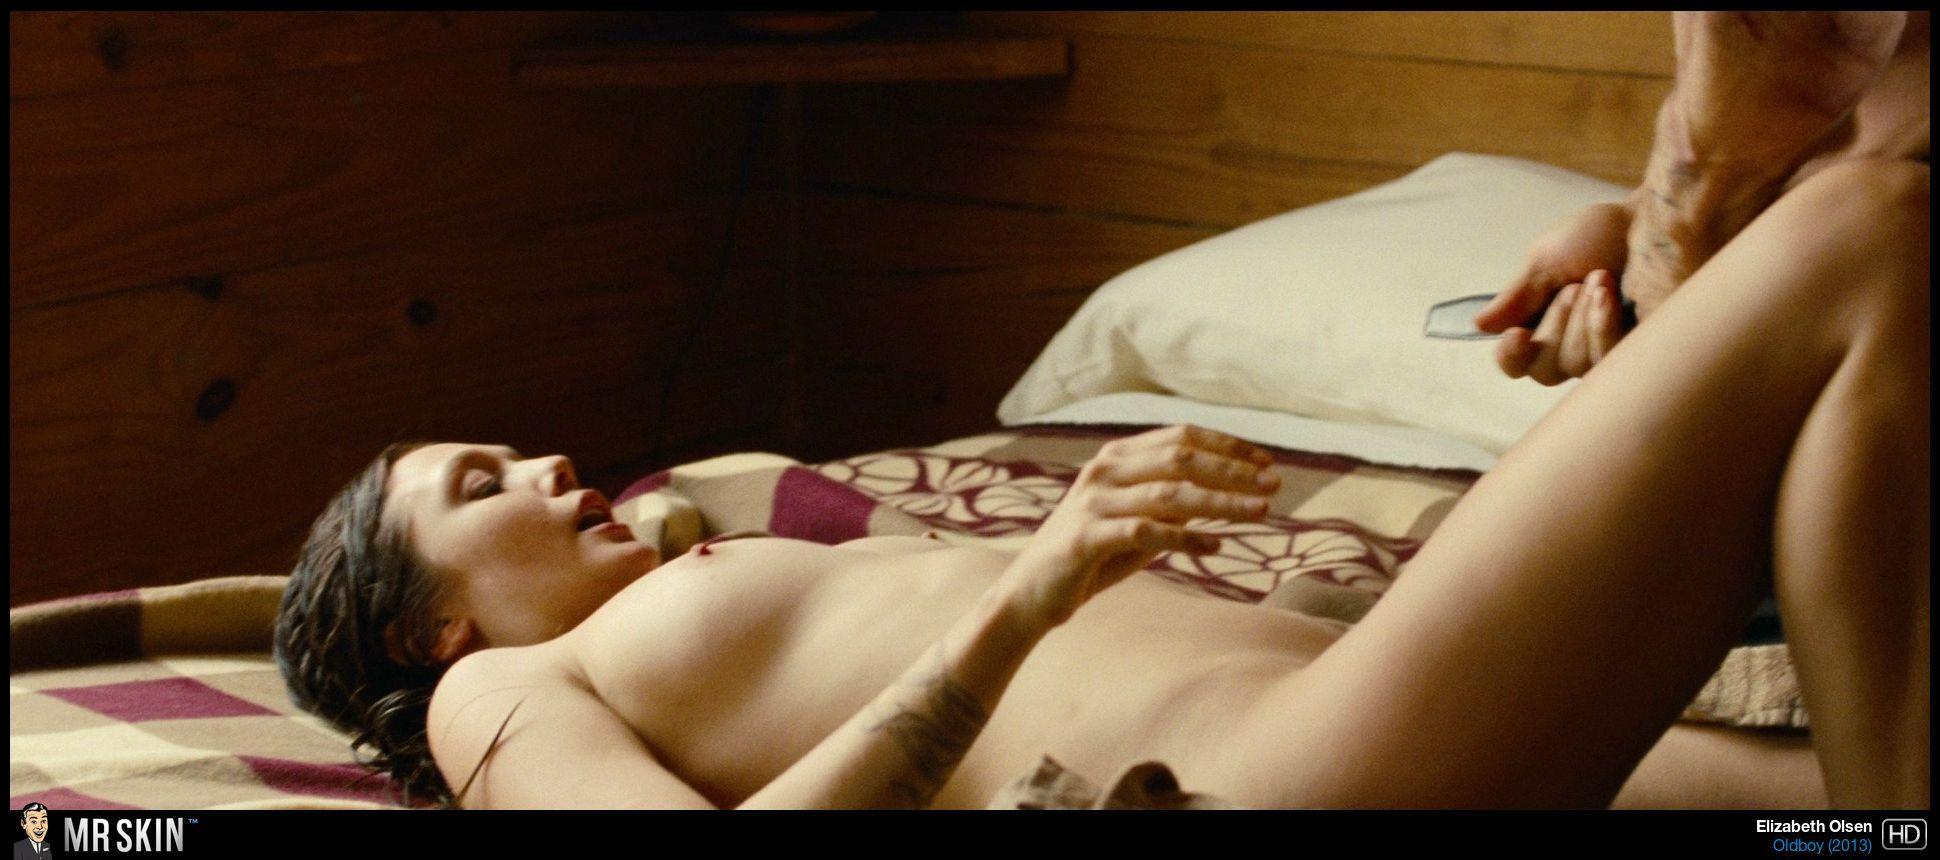 Elizabeth Olsen famoso